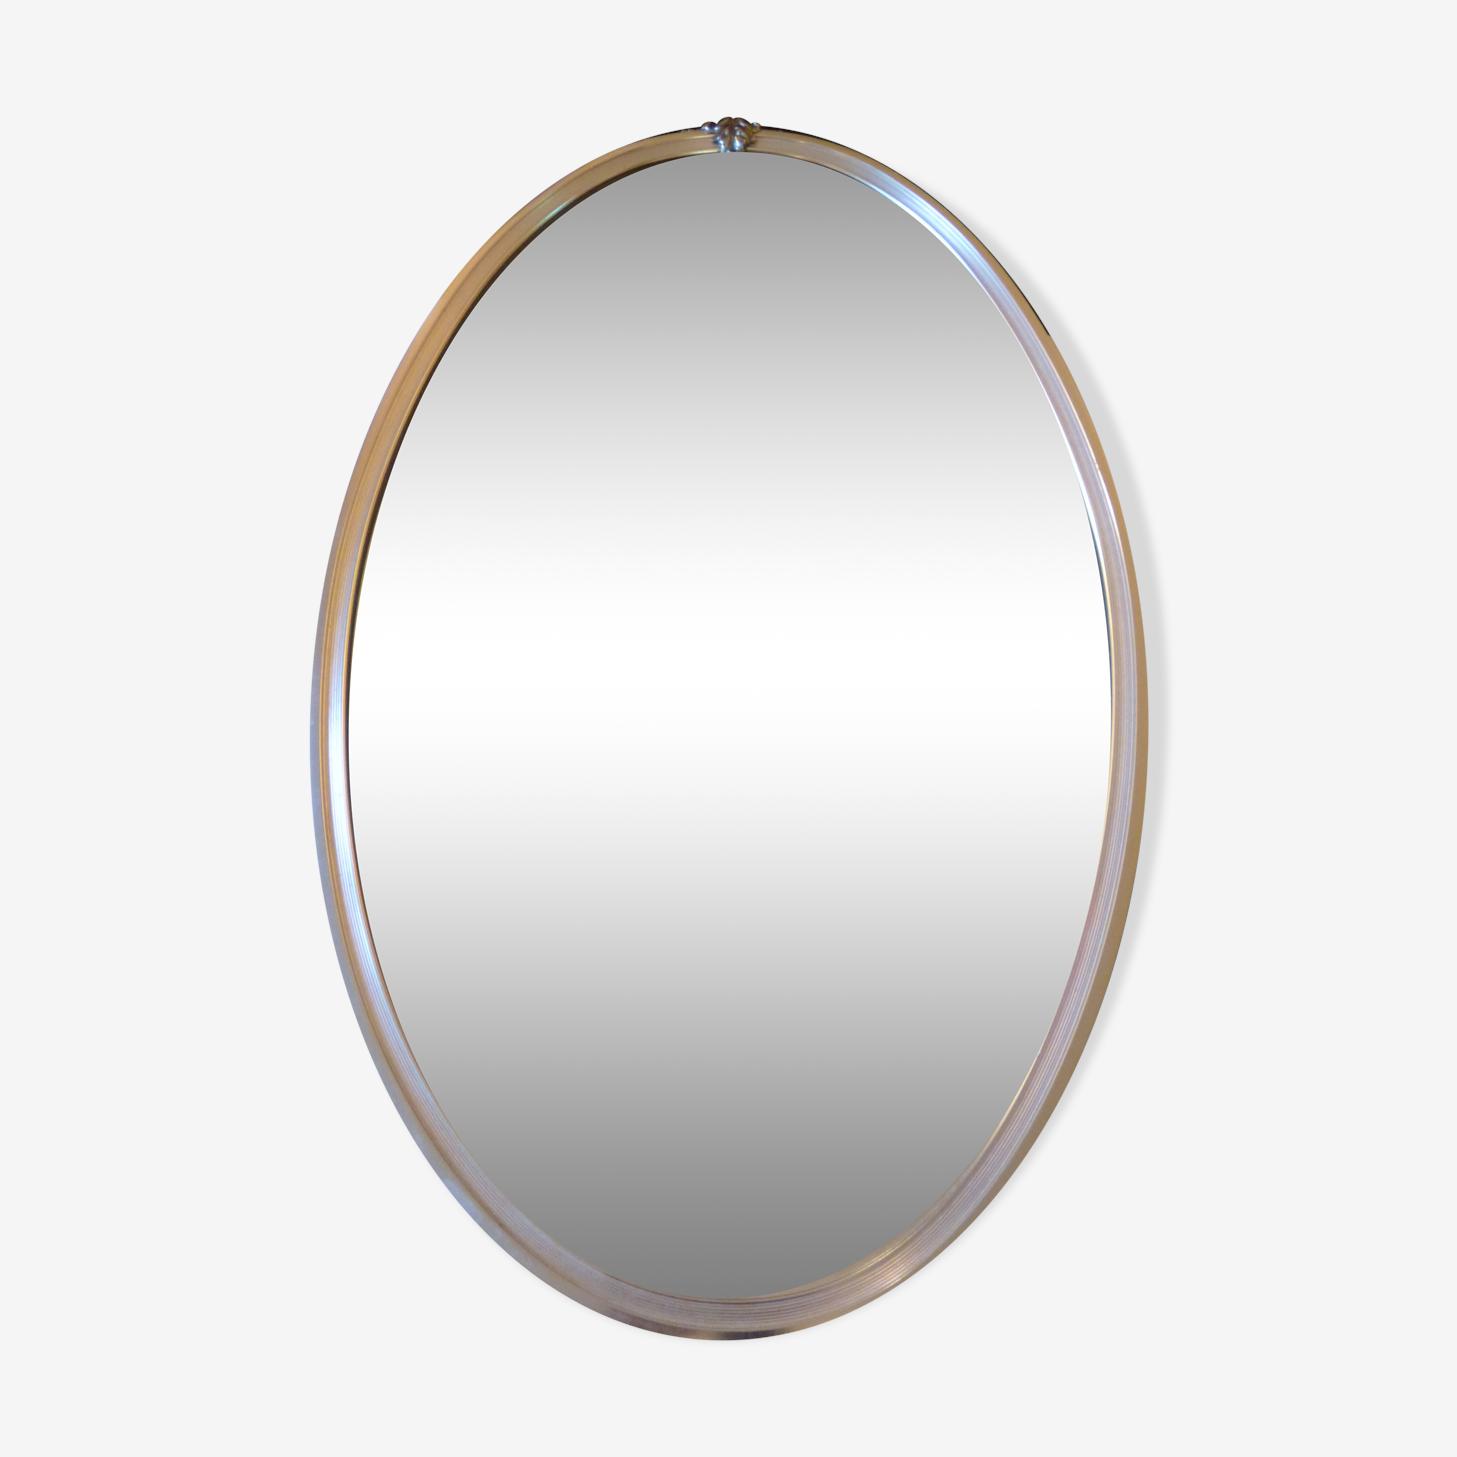 Oval mirror 37x63cm